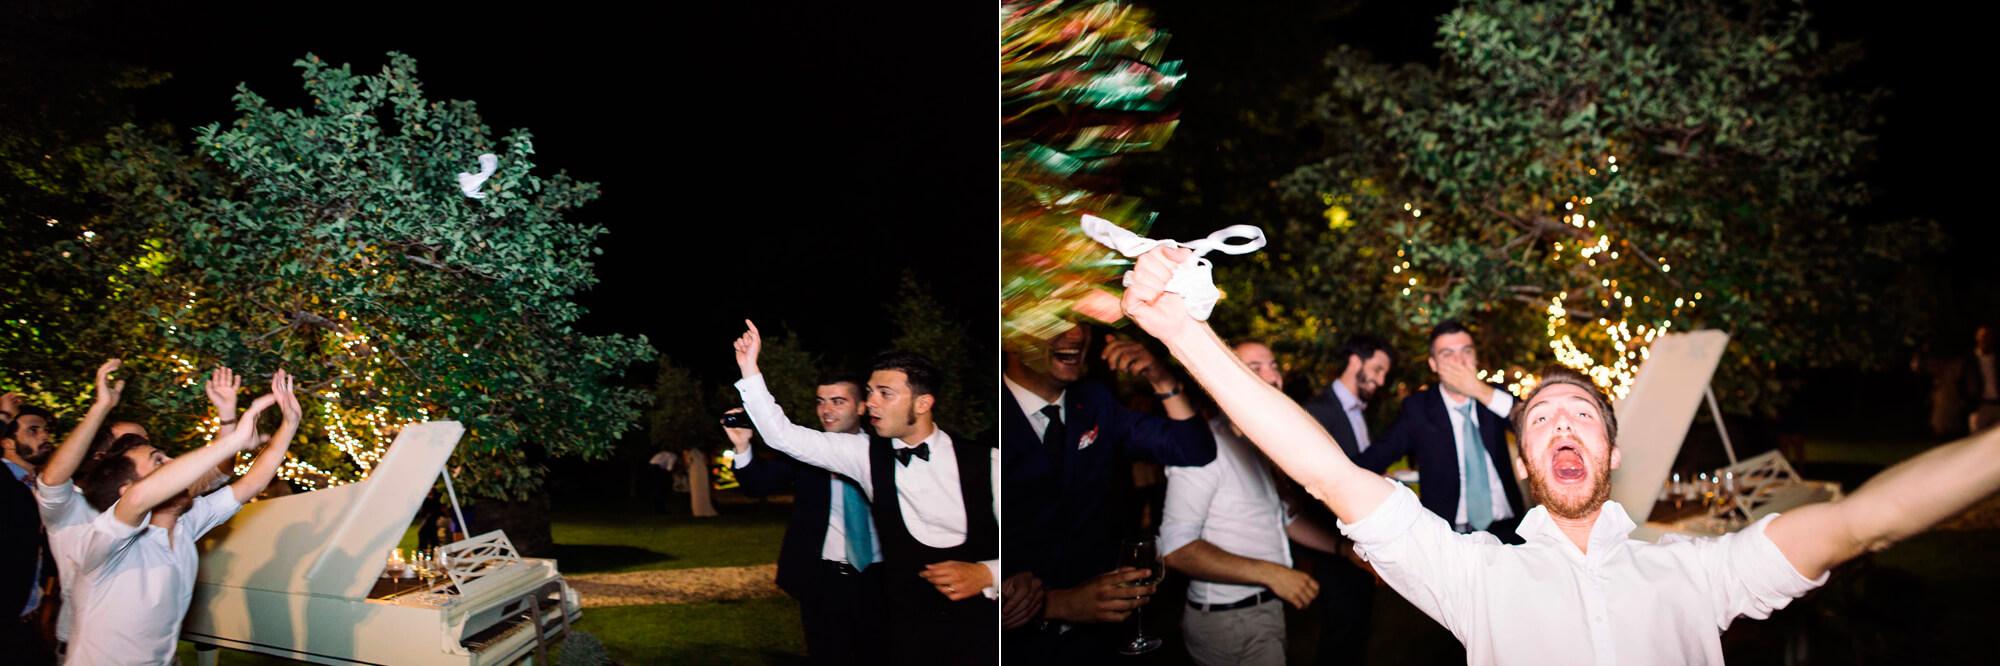 110-arezzo-wedding-photographer.jpg